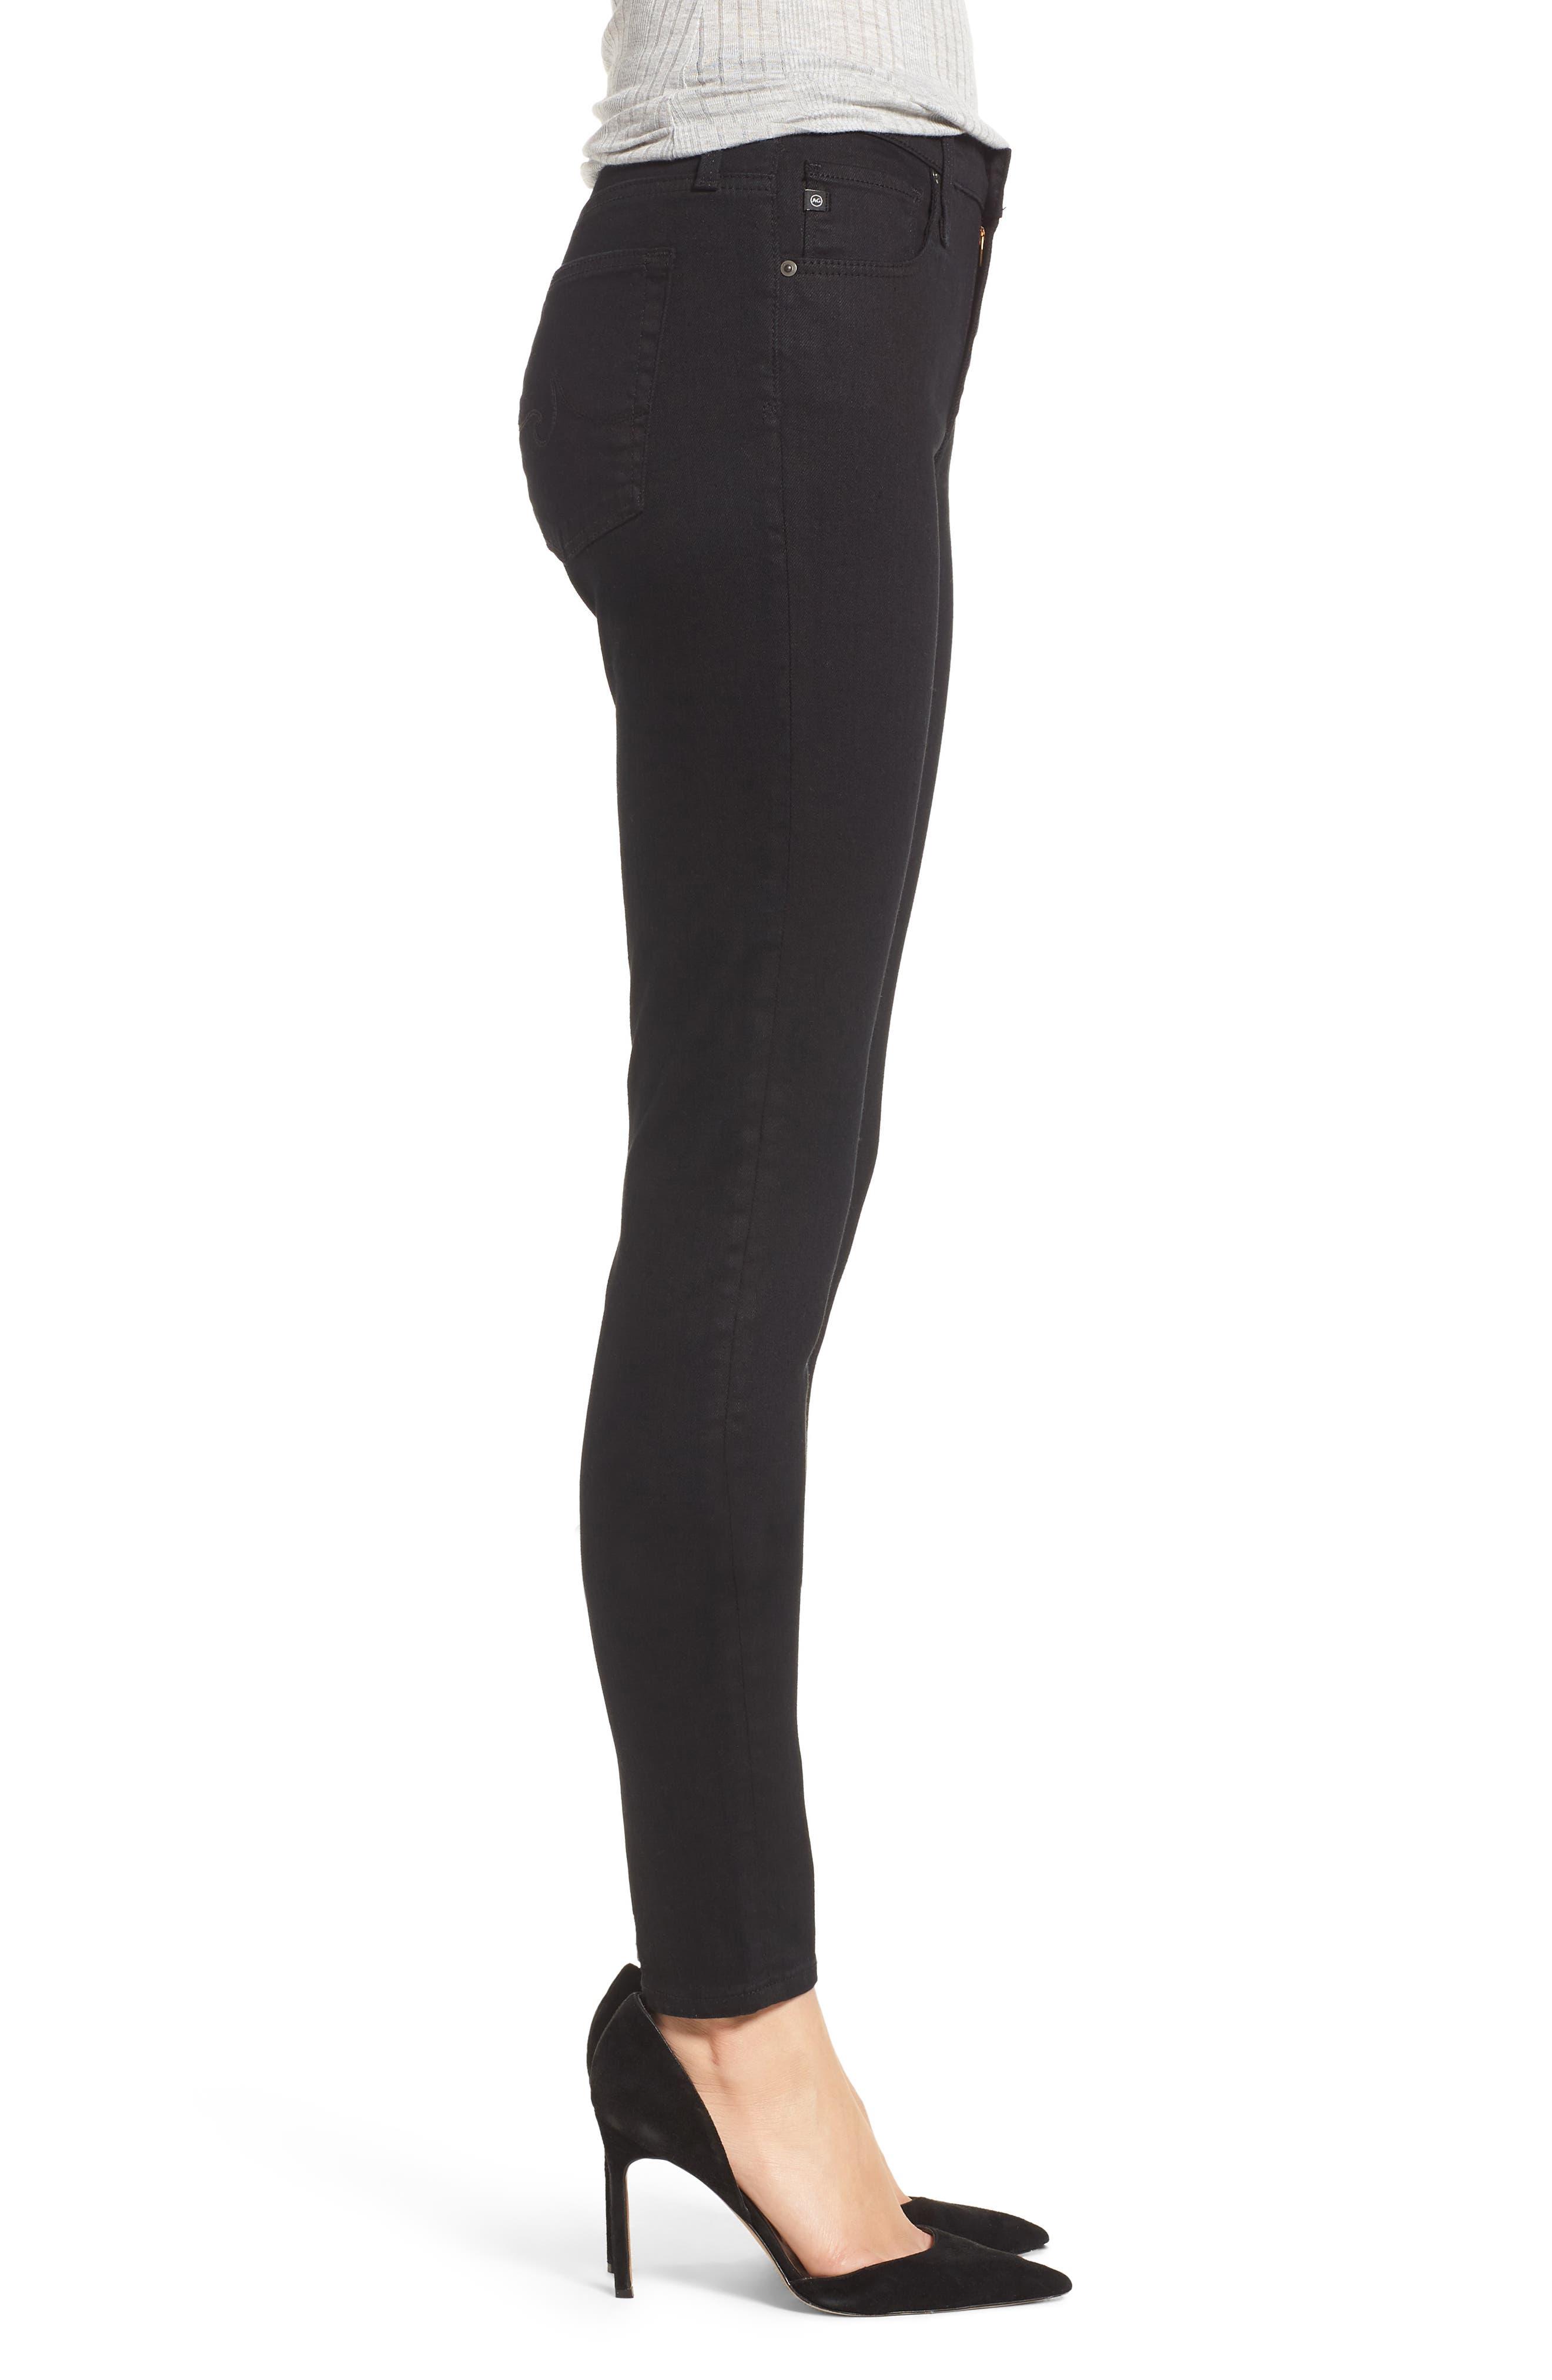 'The Farrah' High Rise Skinny Jeans,                             Alternate thumbnail 3, color,                             Overdyed Black